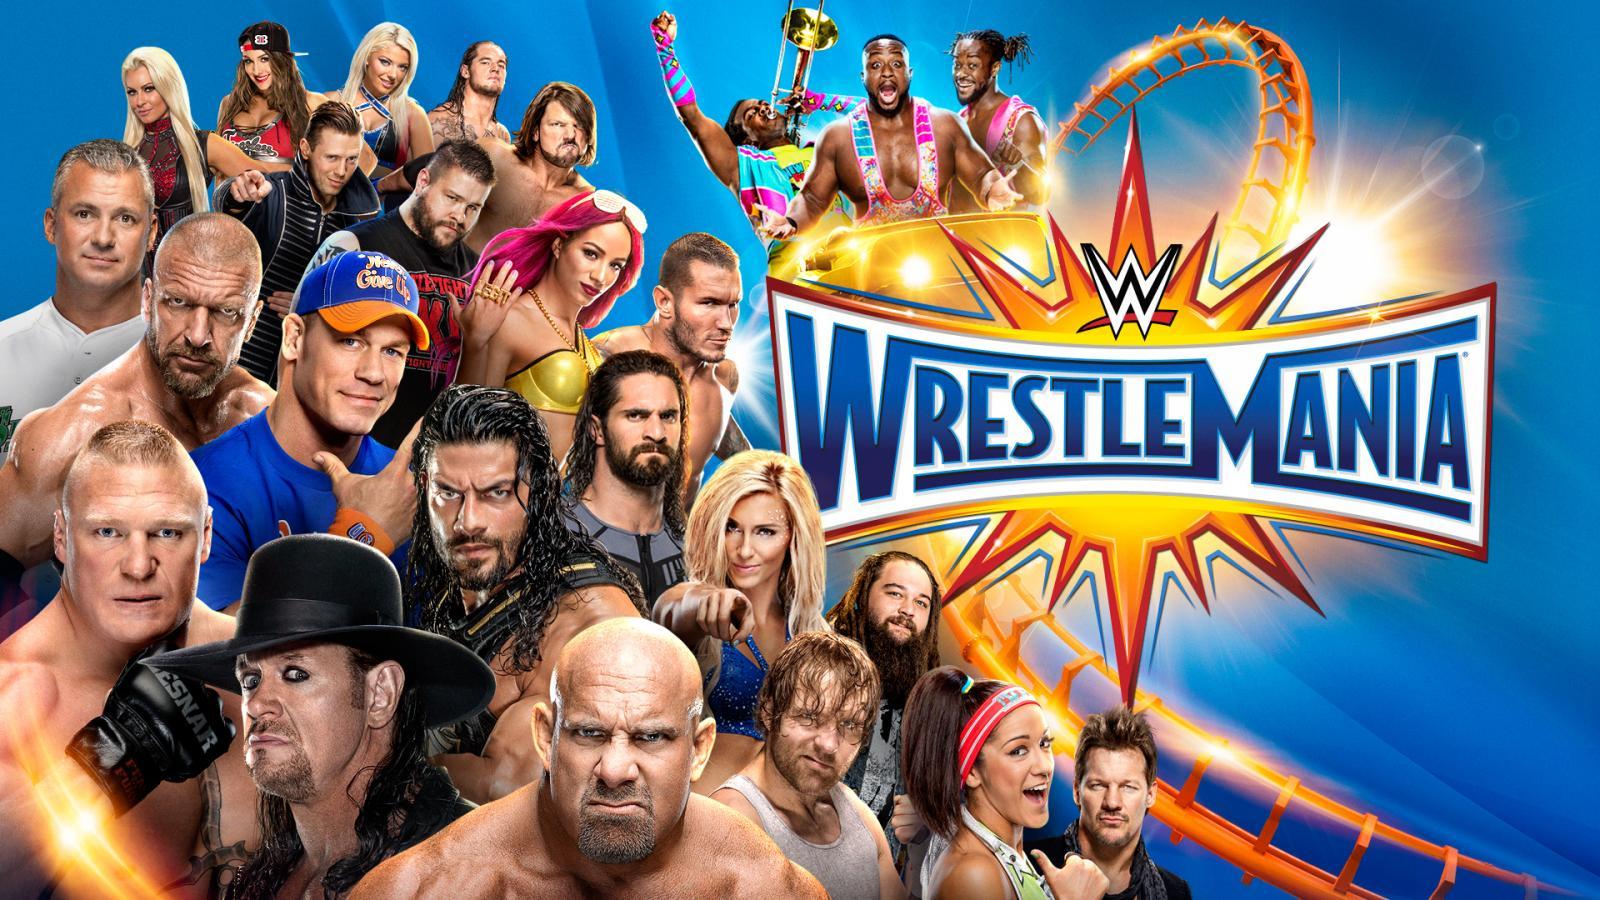 Image courtesy of WWE.com